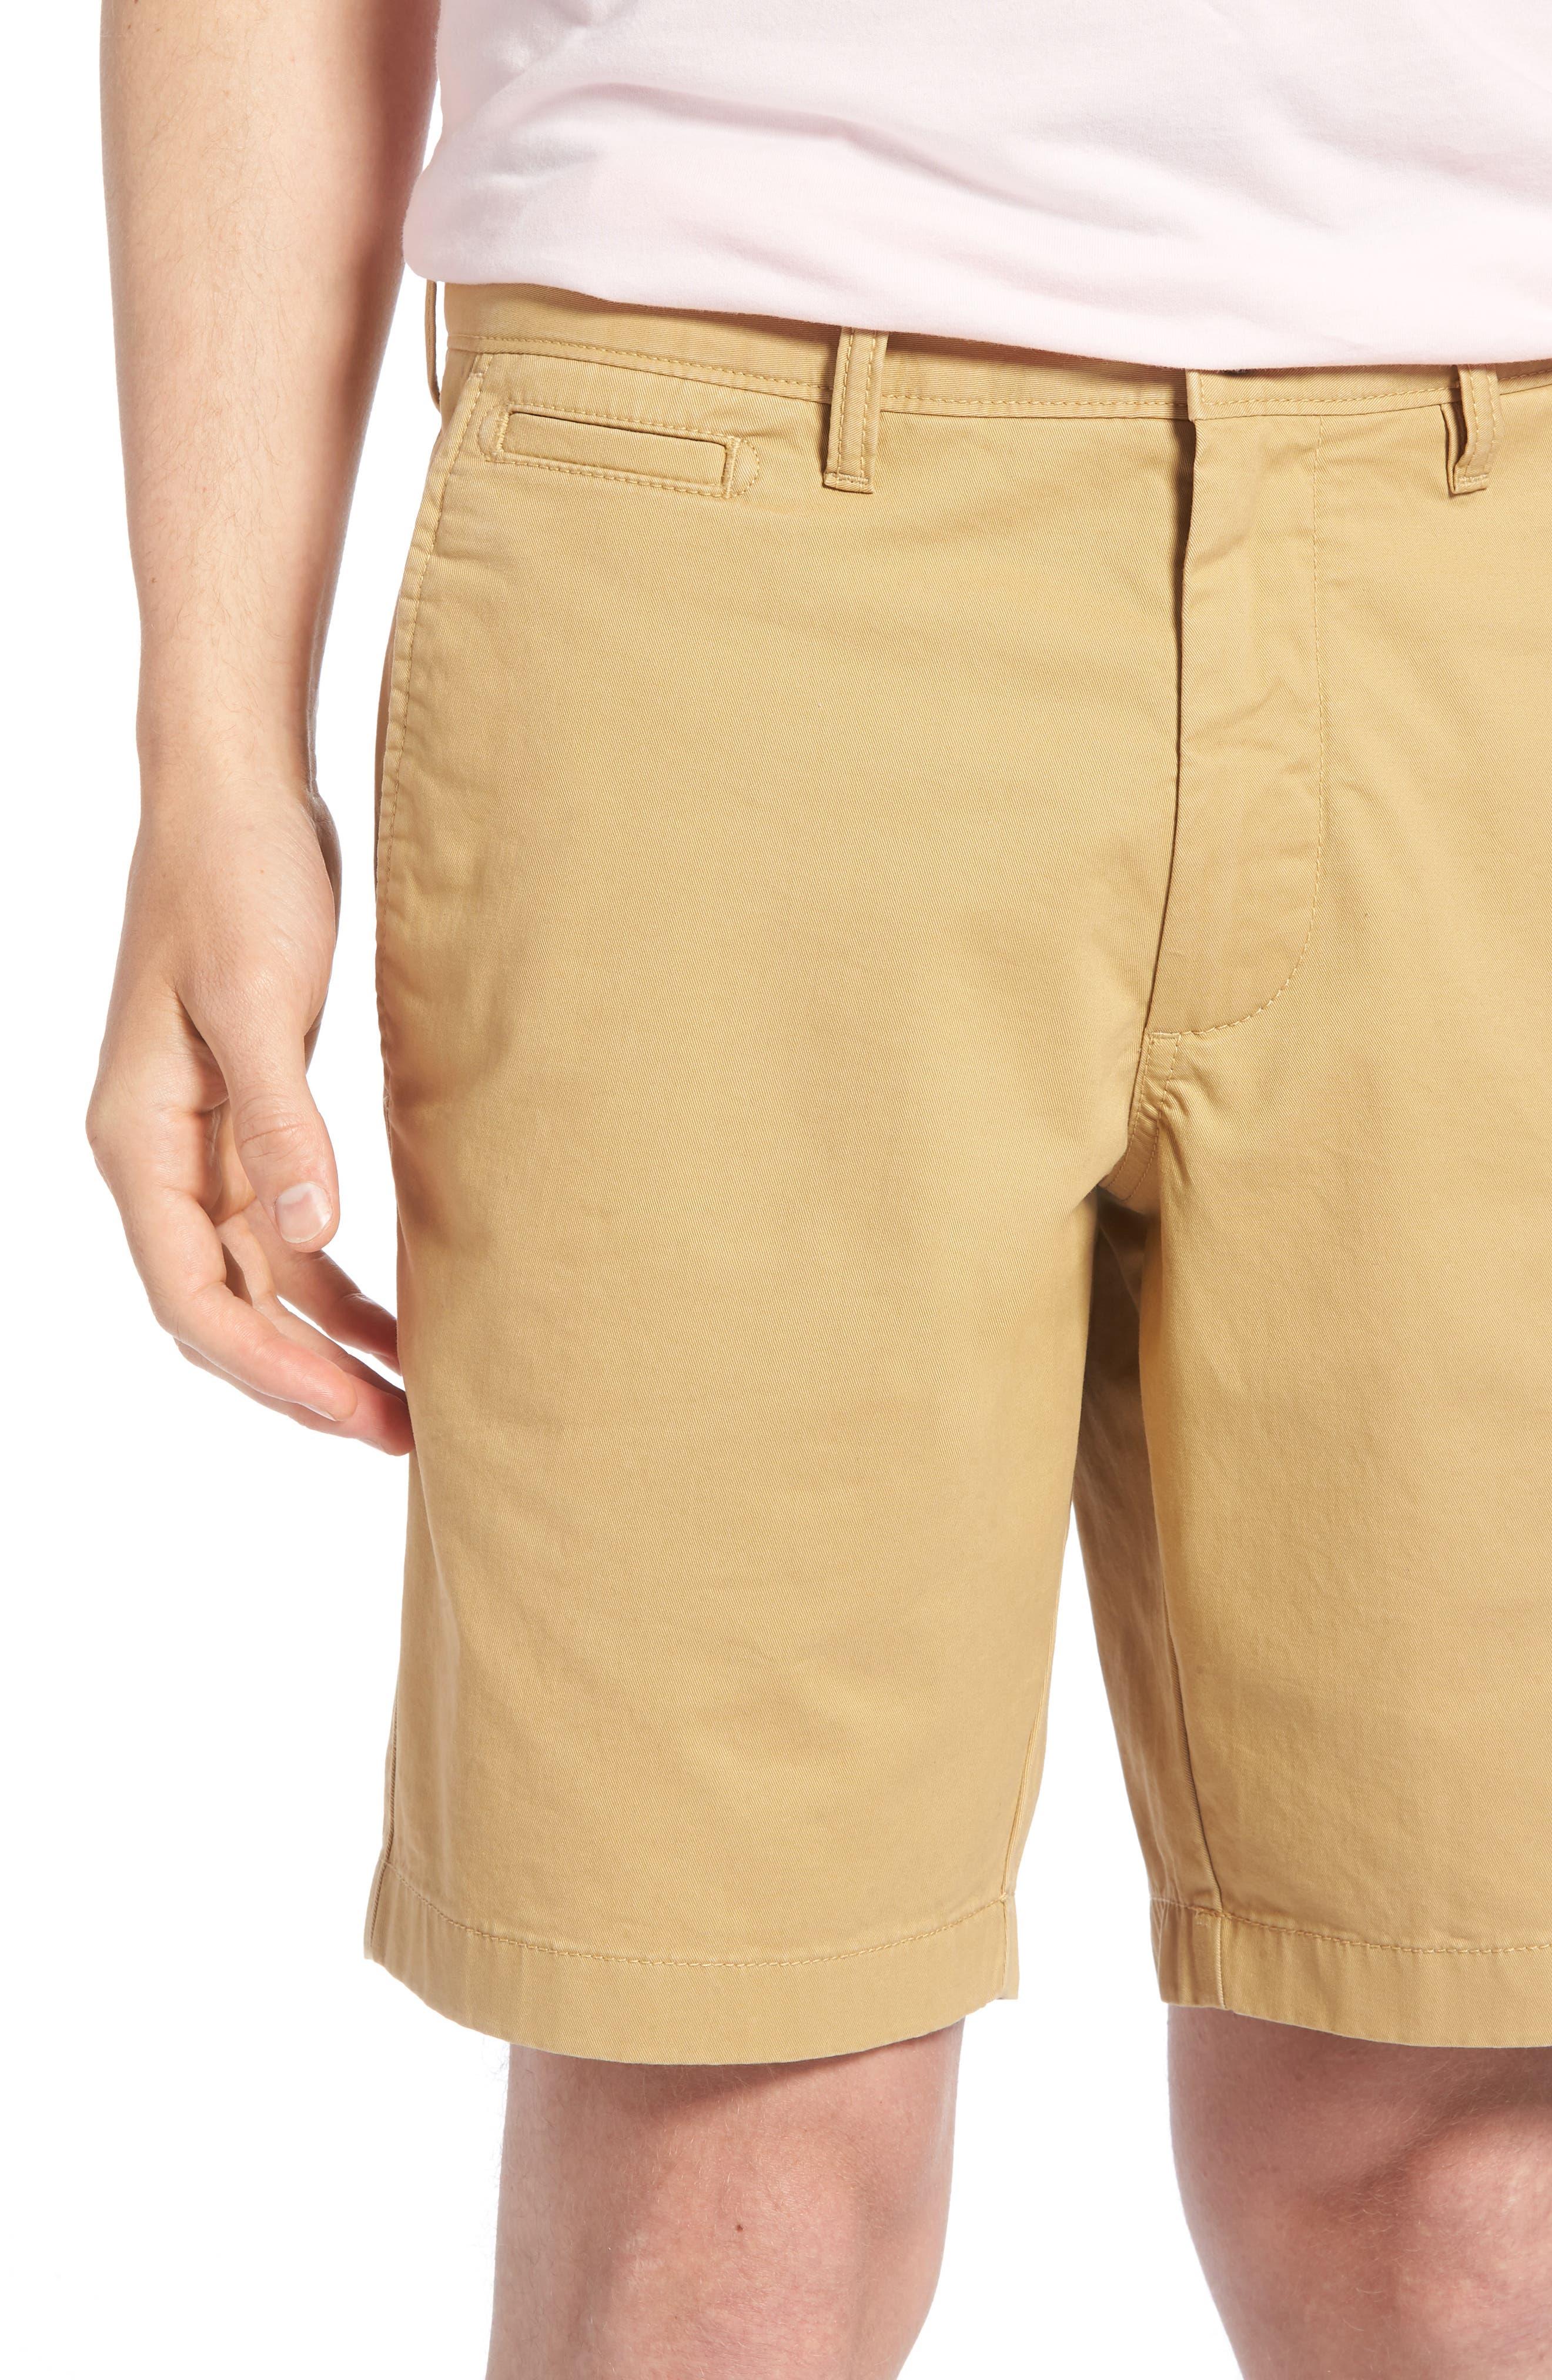 Ballard Slim Fit Stretch Chino 9-Inch Shorts,                             Alternate thumbnail 4, color,                             TAN LARK